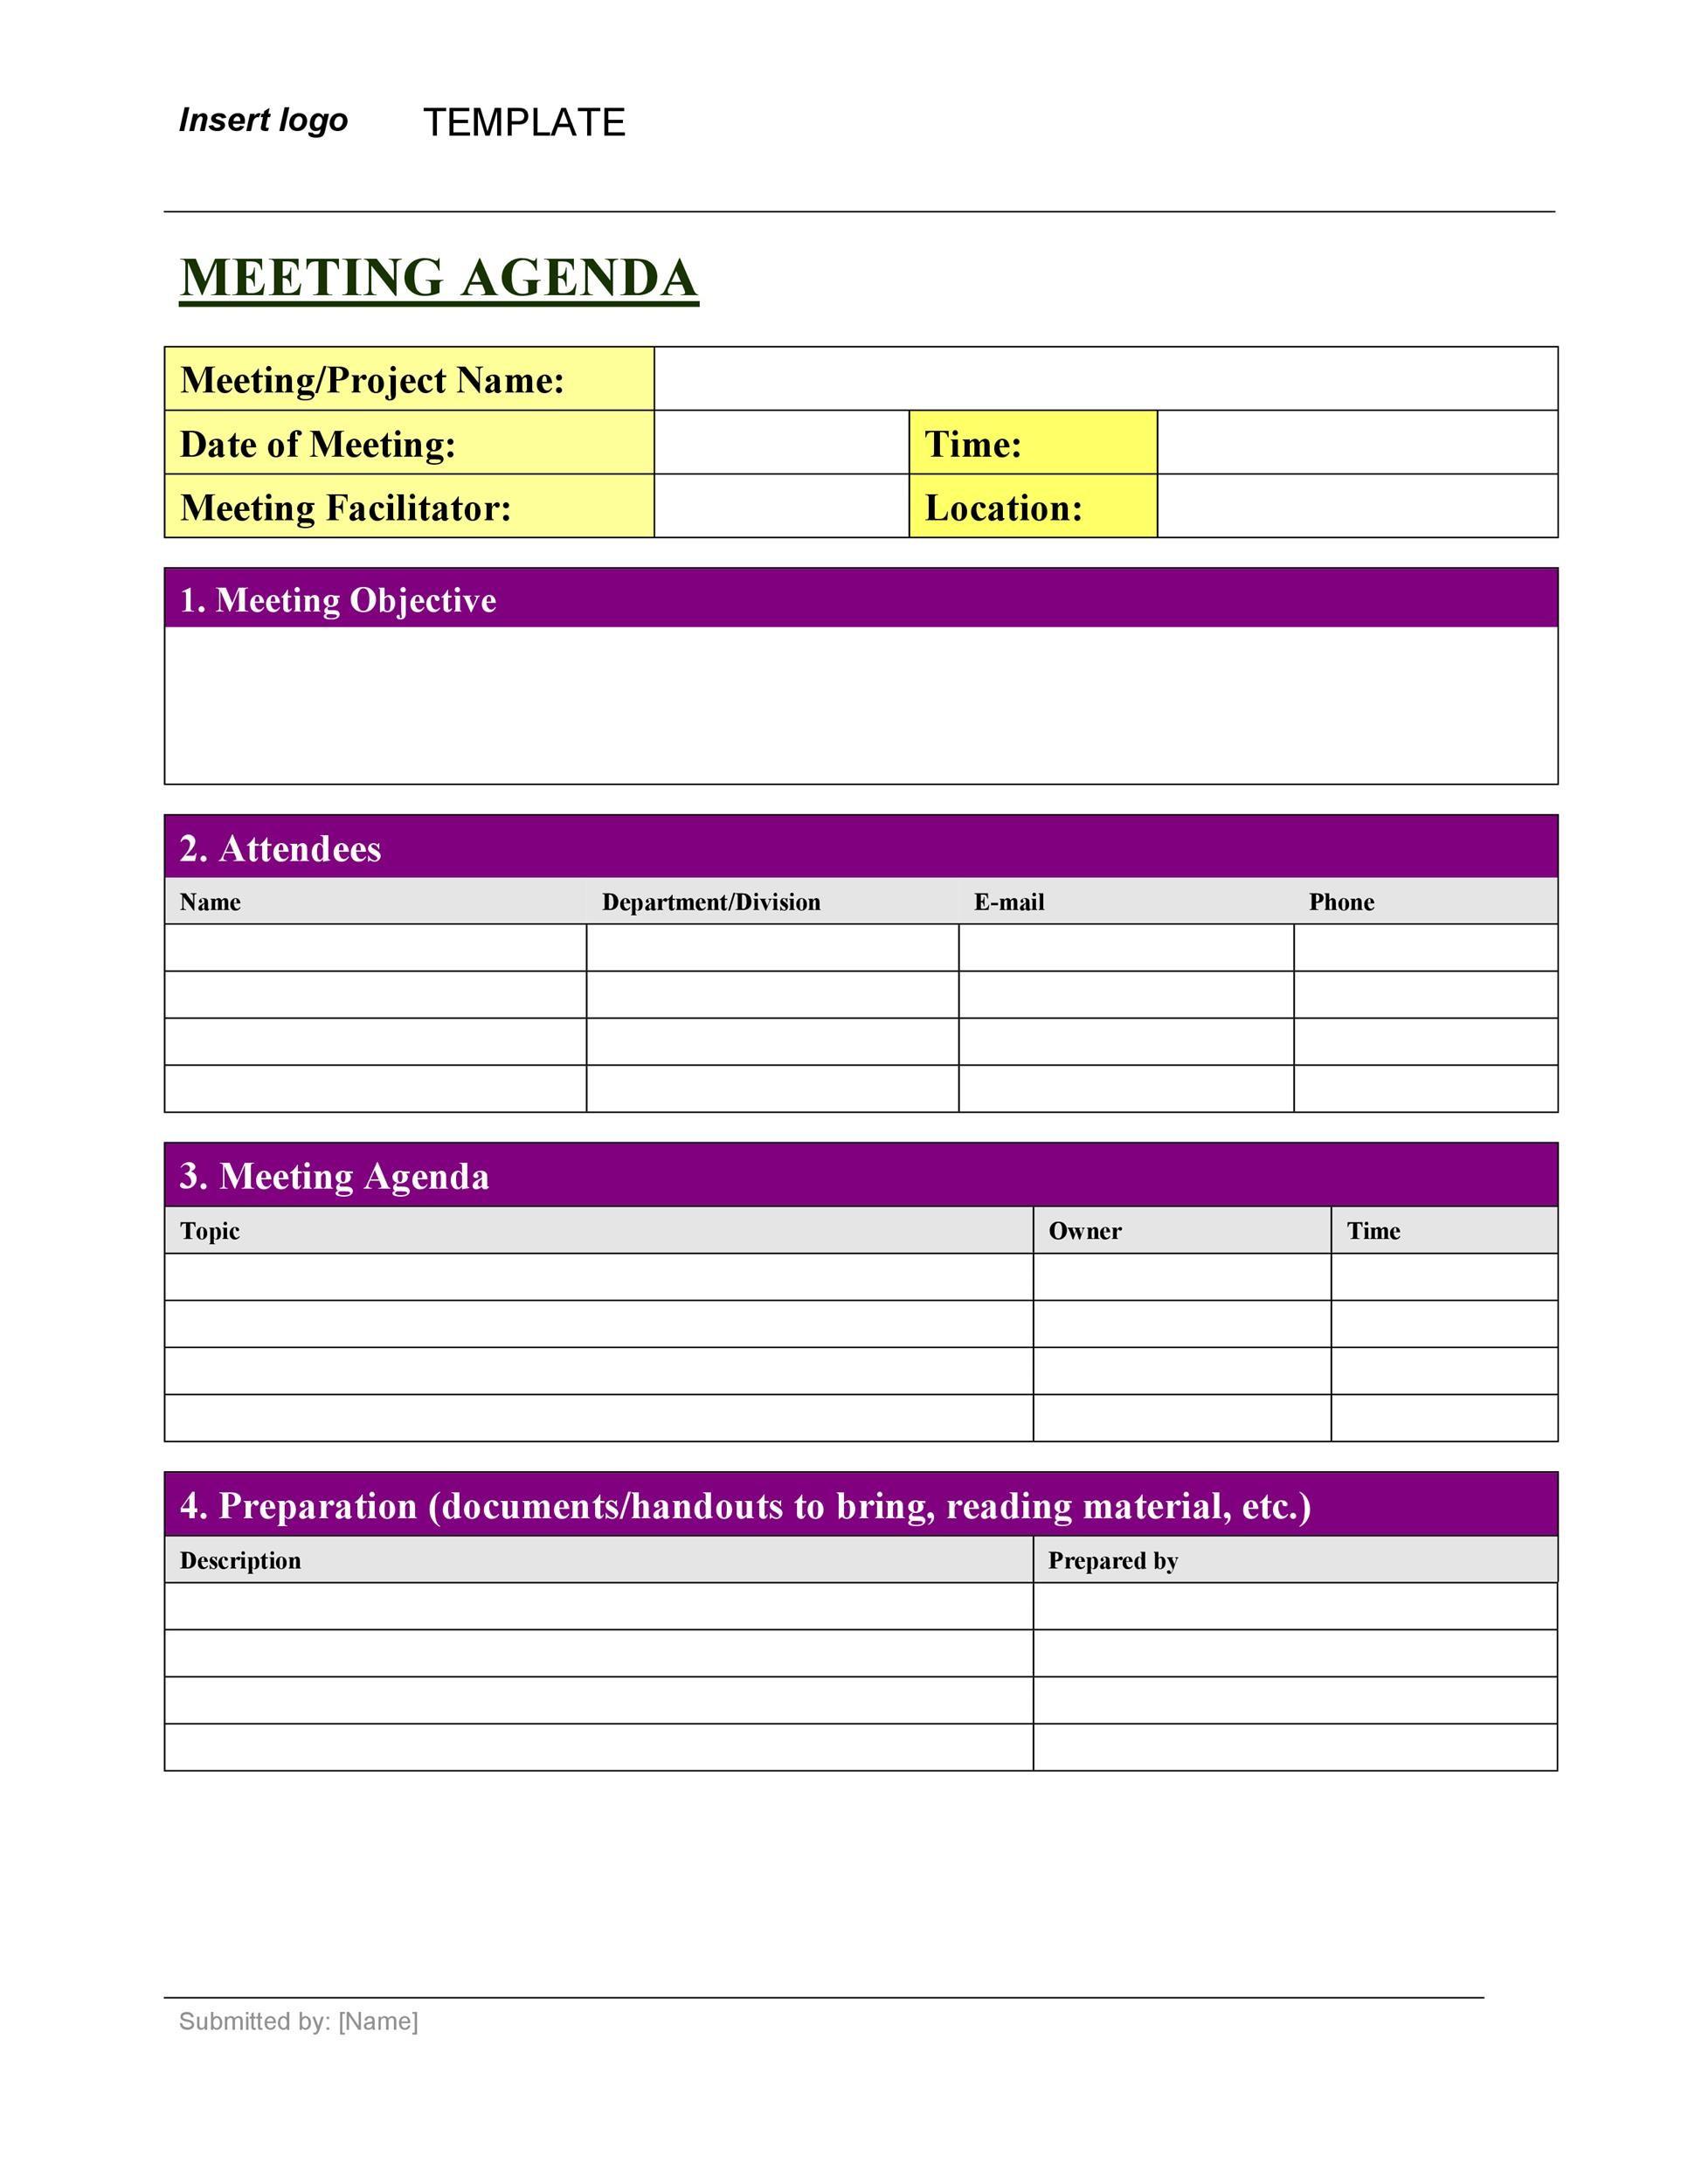 Meeting Notes Templates